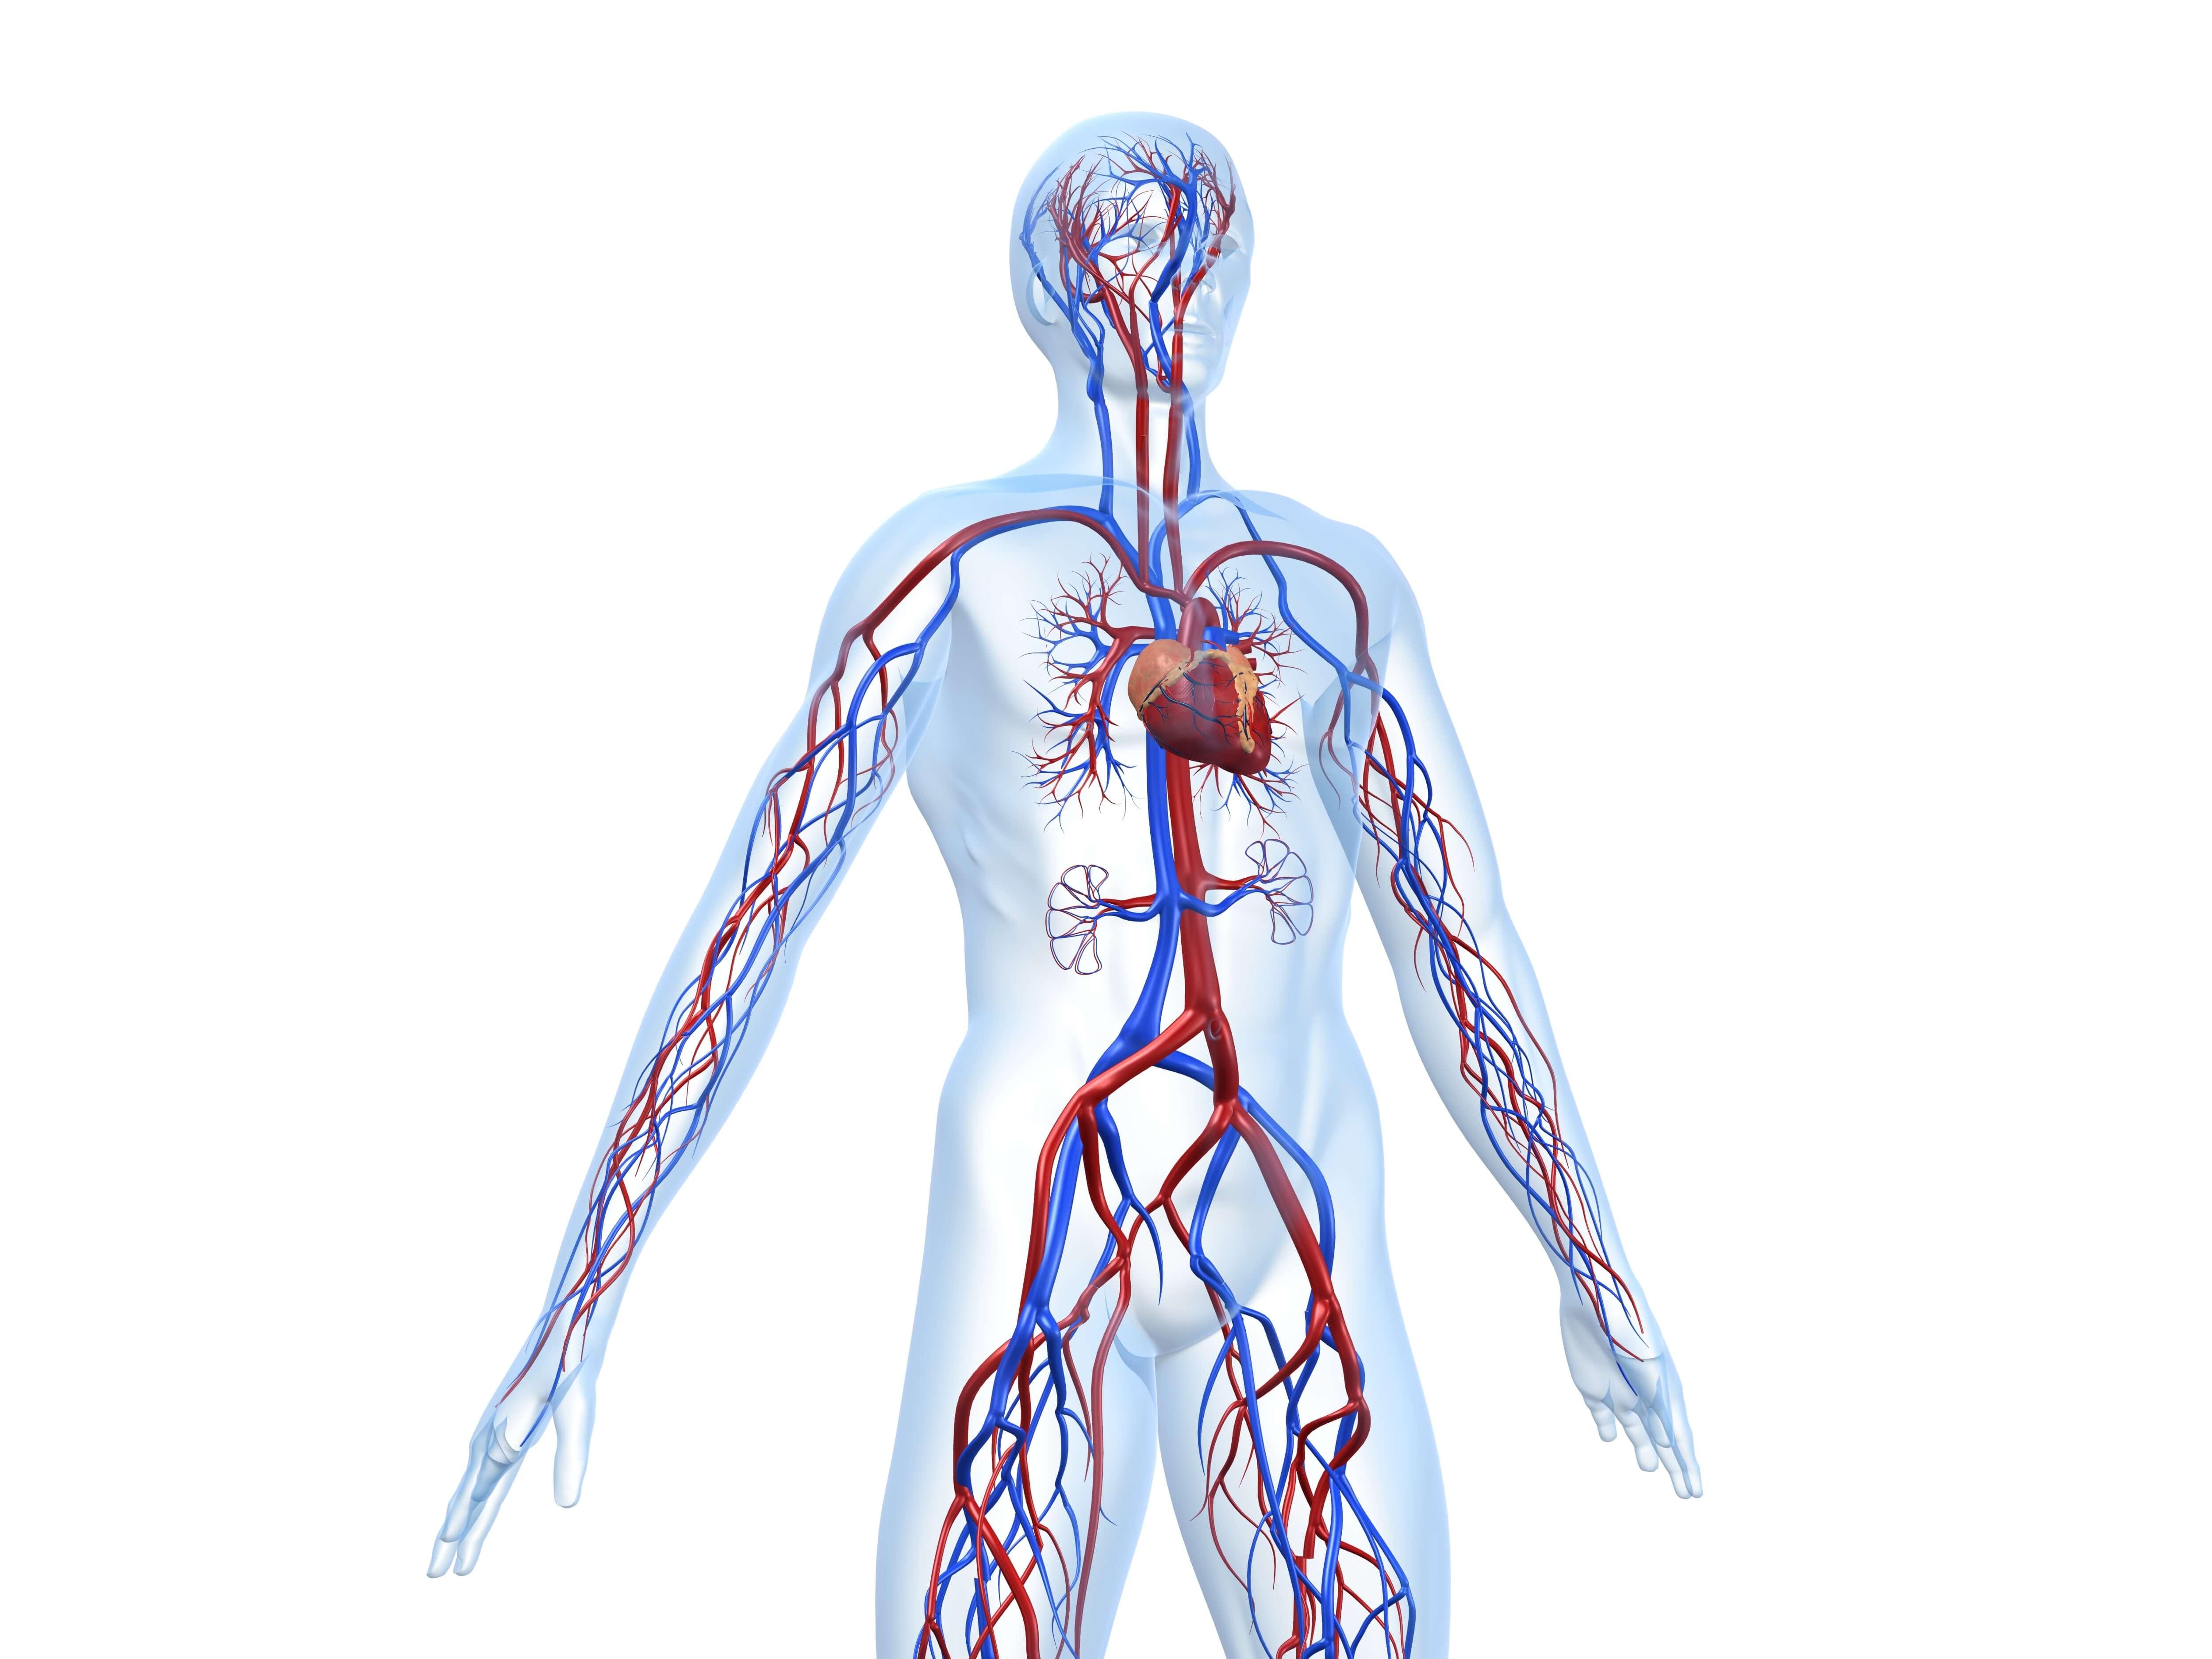 Arterial Exam | Peripheral Arterial Disease | NAVIX Vascular Lab